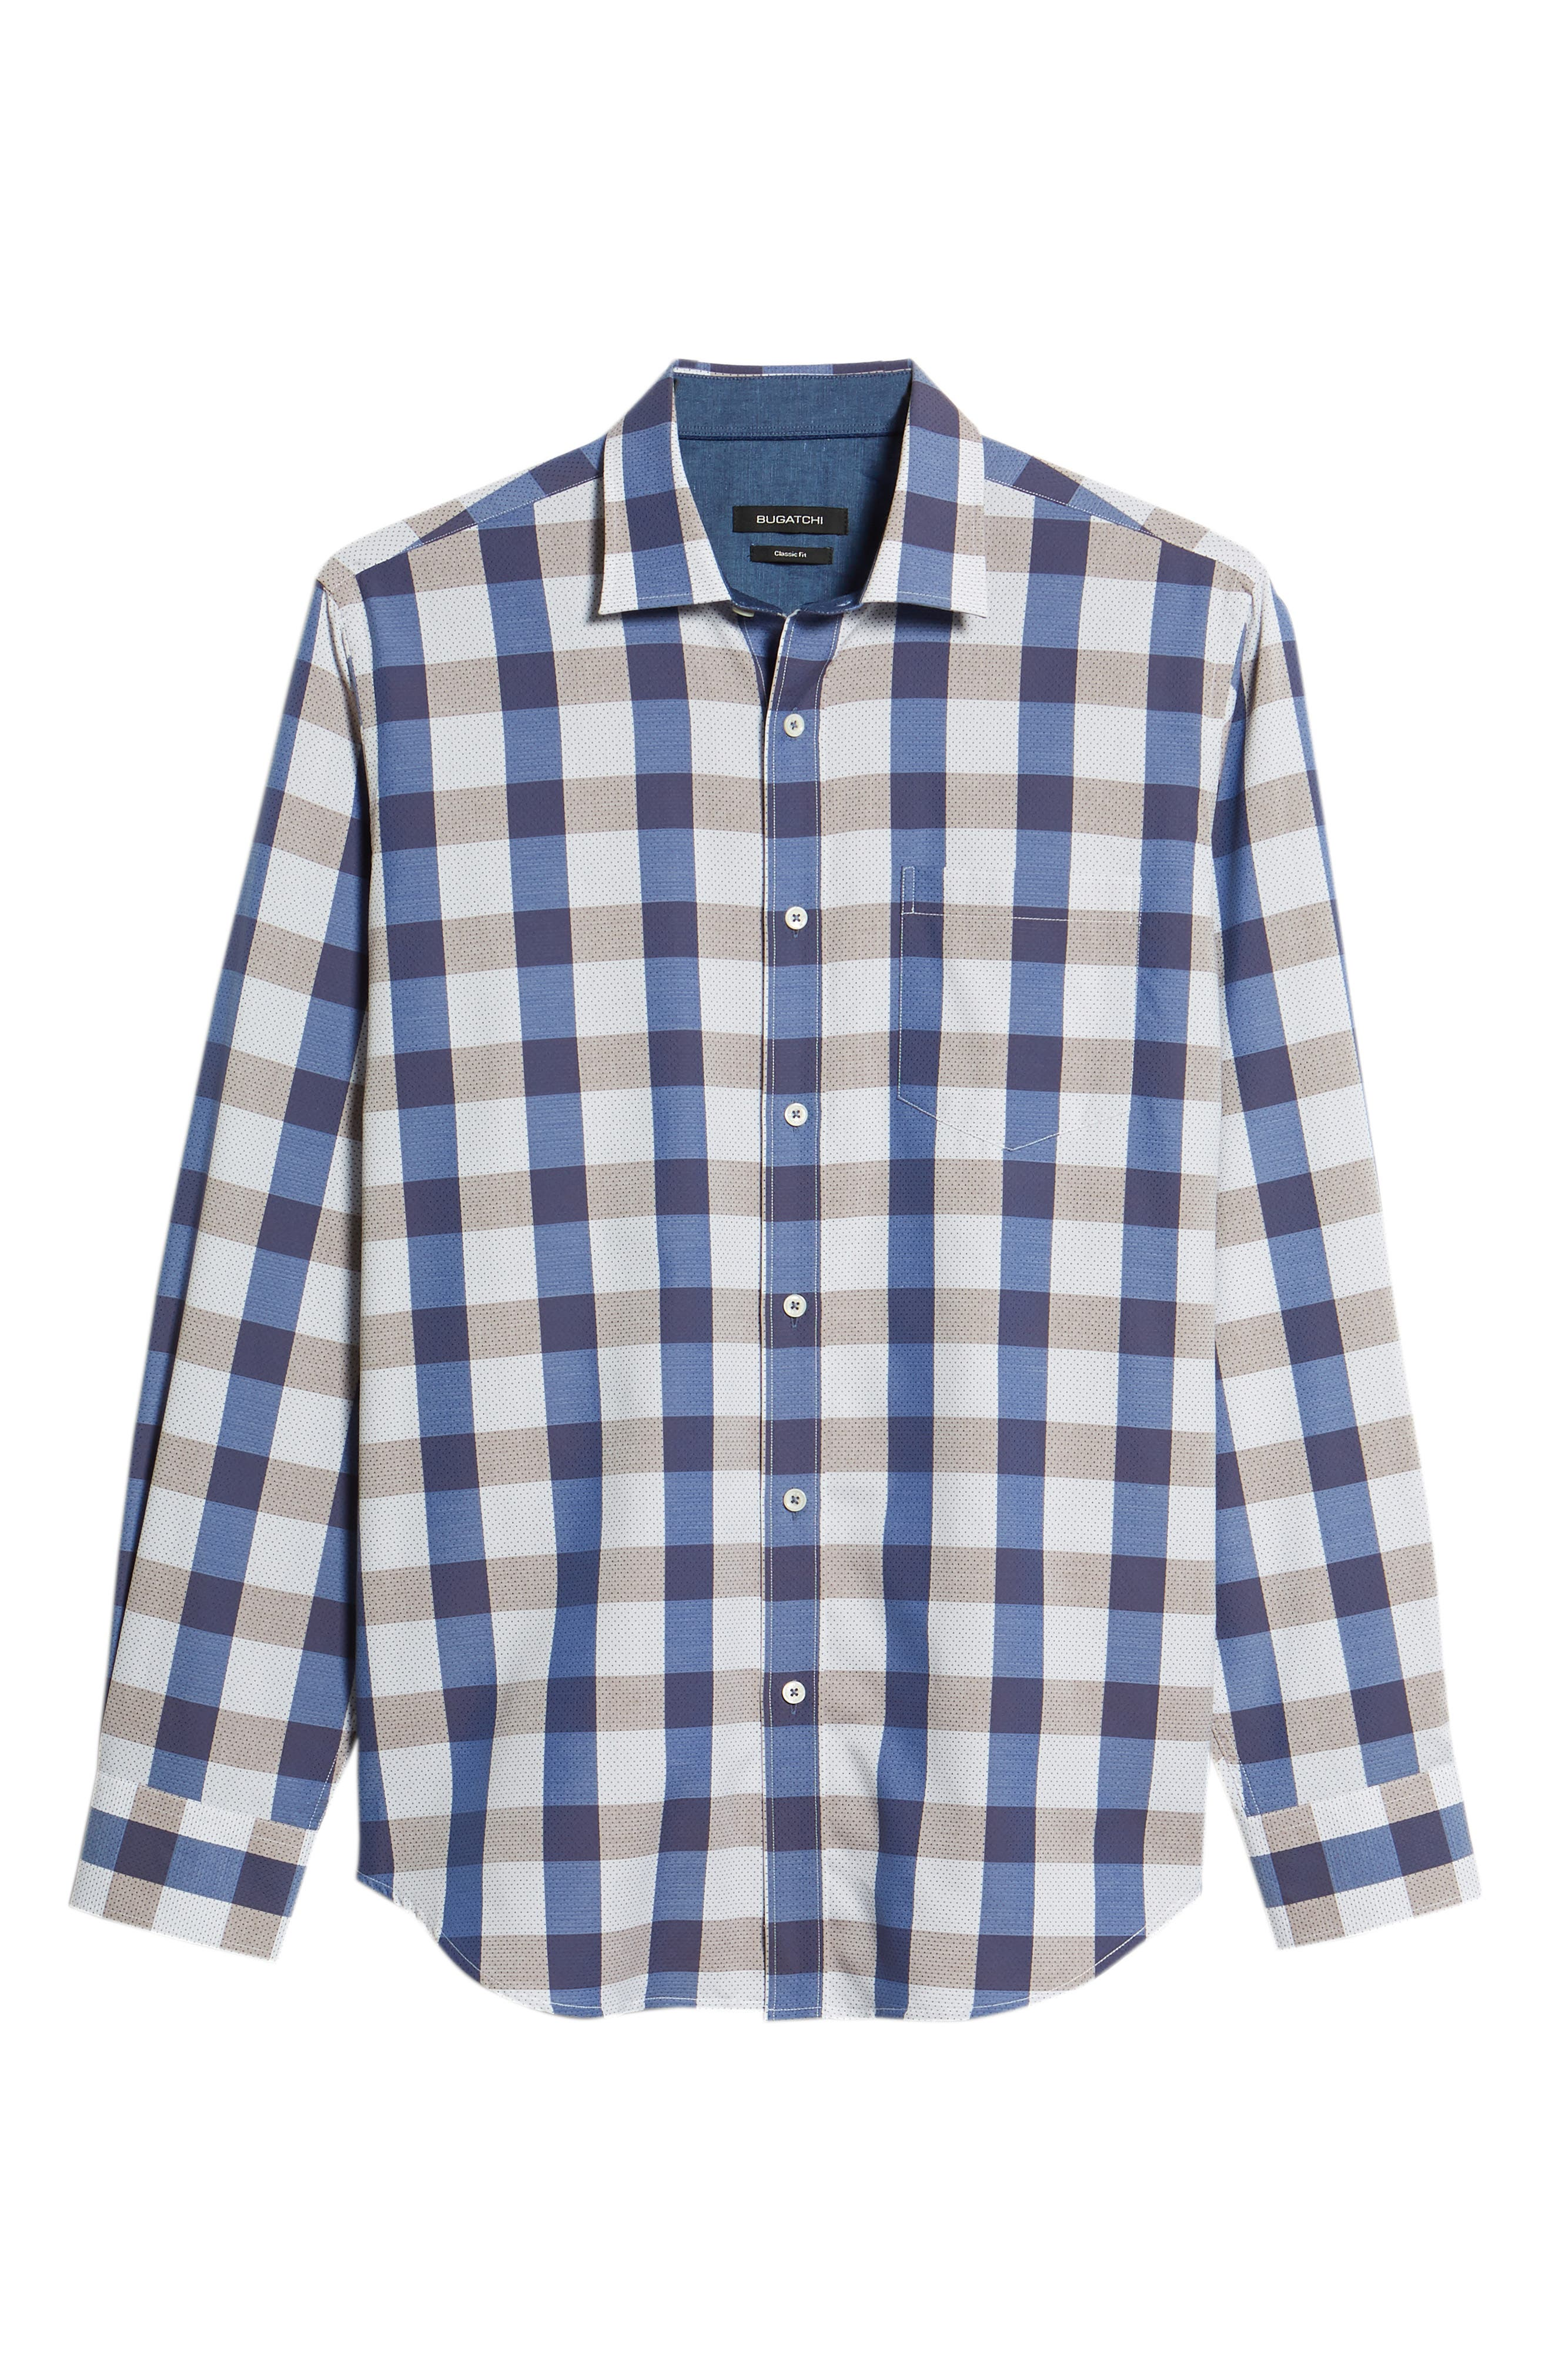 BUGATCHI,                             Classic Fit Check on Dot Sport Shirt,                             Alternate thumbnail 6, color,                             104